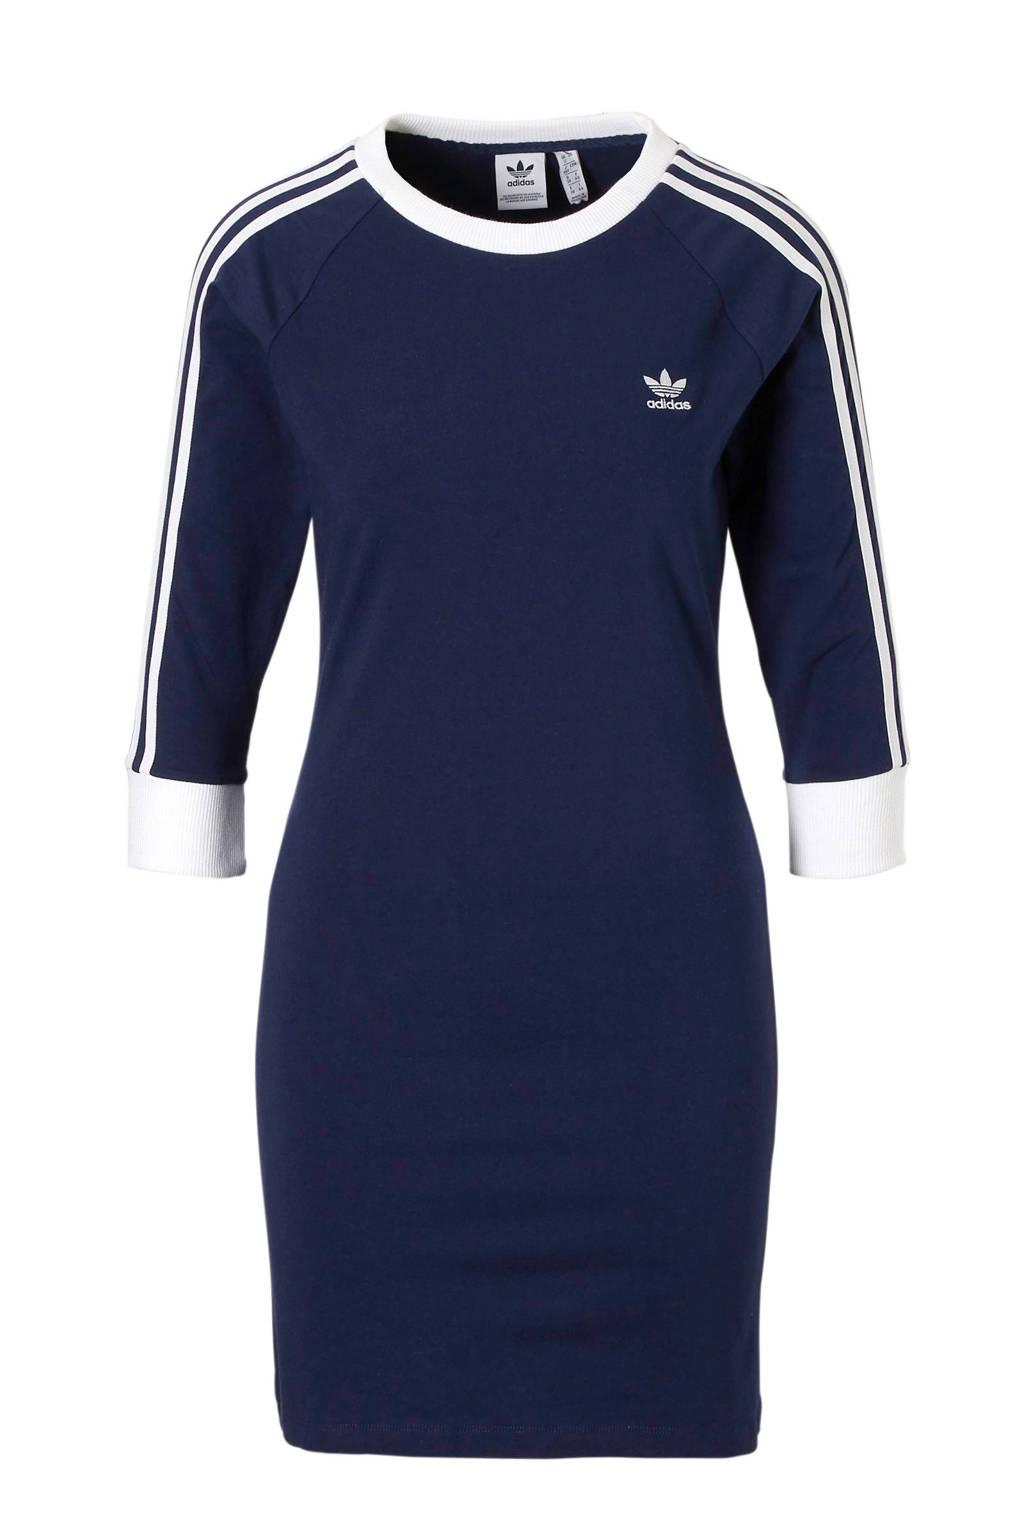 adidas originals jurk donkerblauw, Donkerblauw/wit